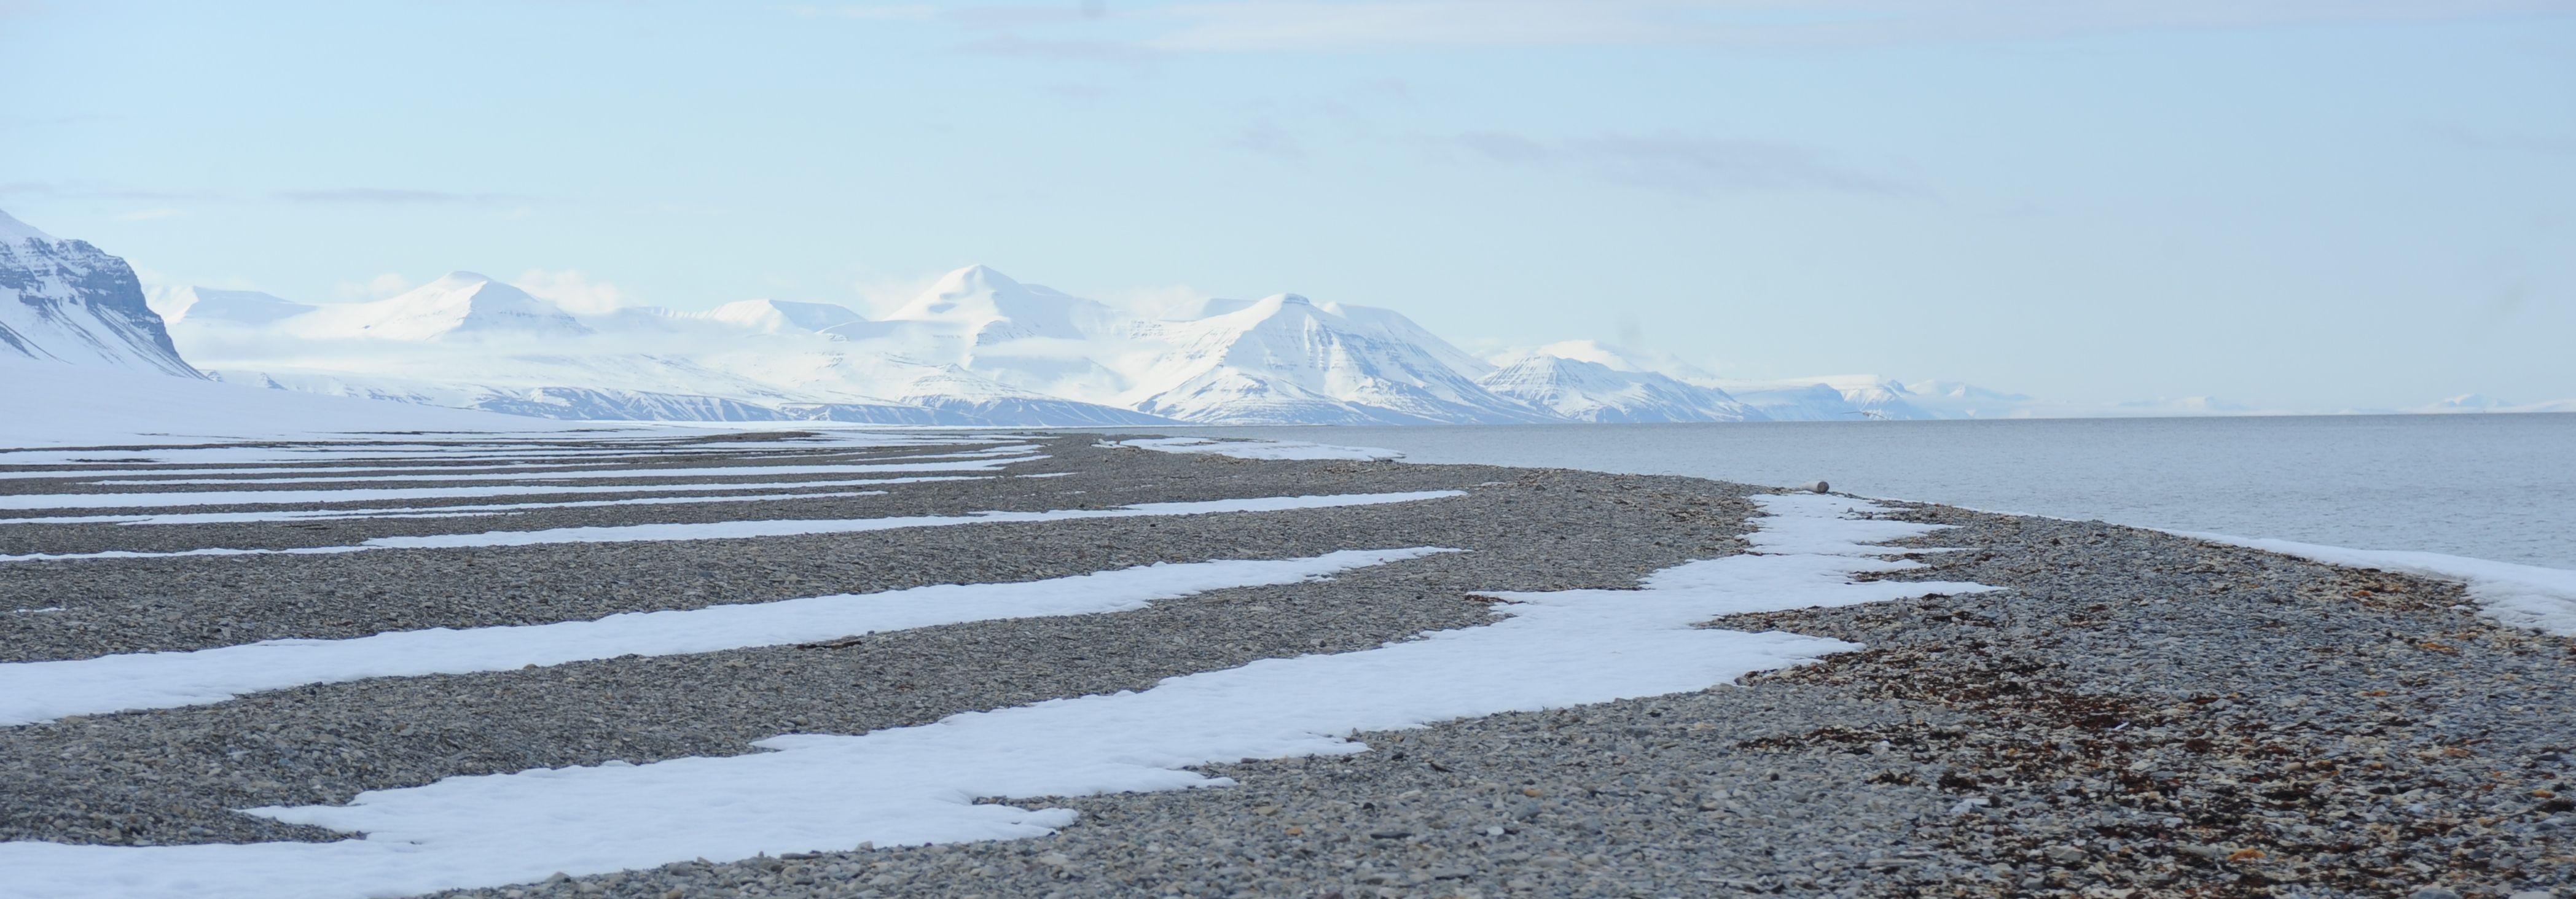 Svalbard-1-AntonioAlcami_CSIC